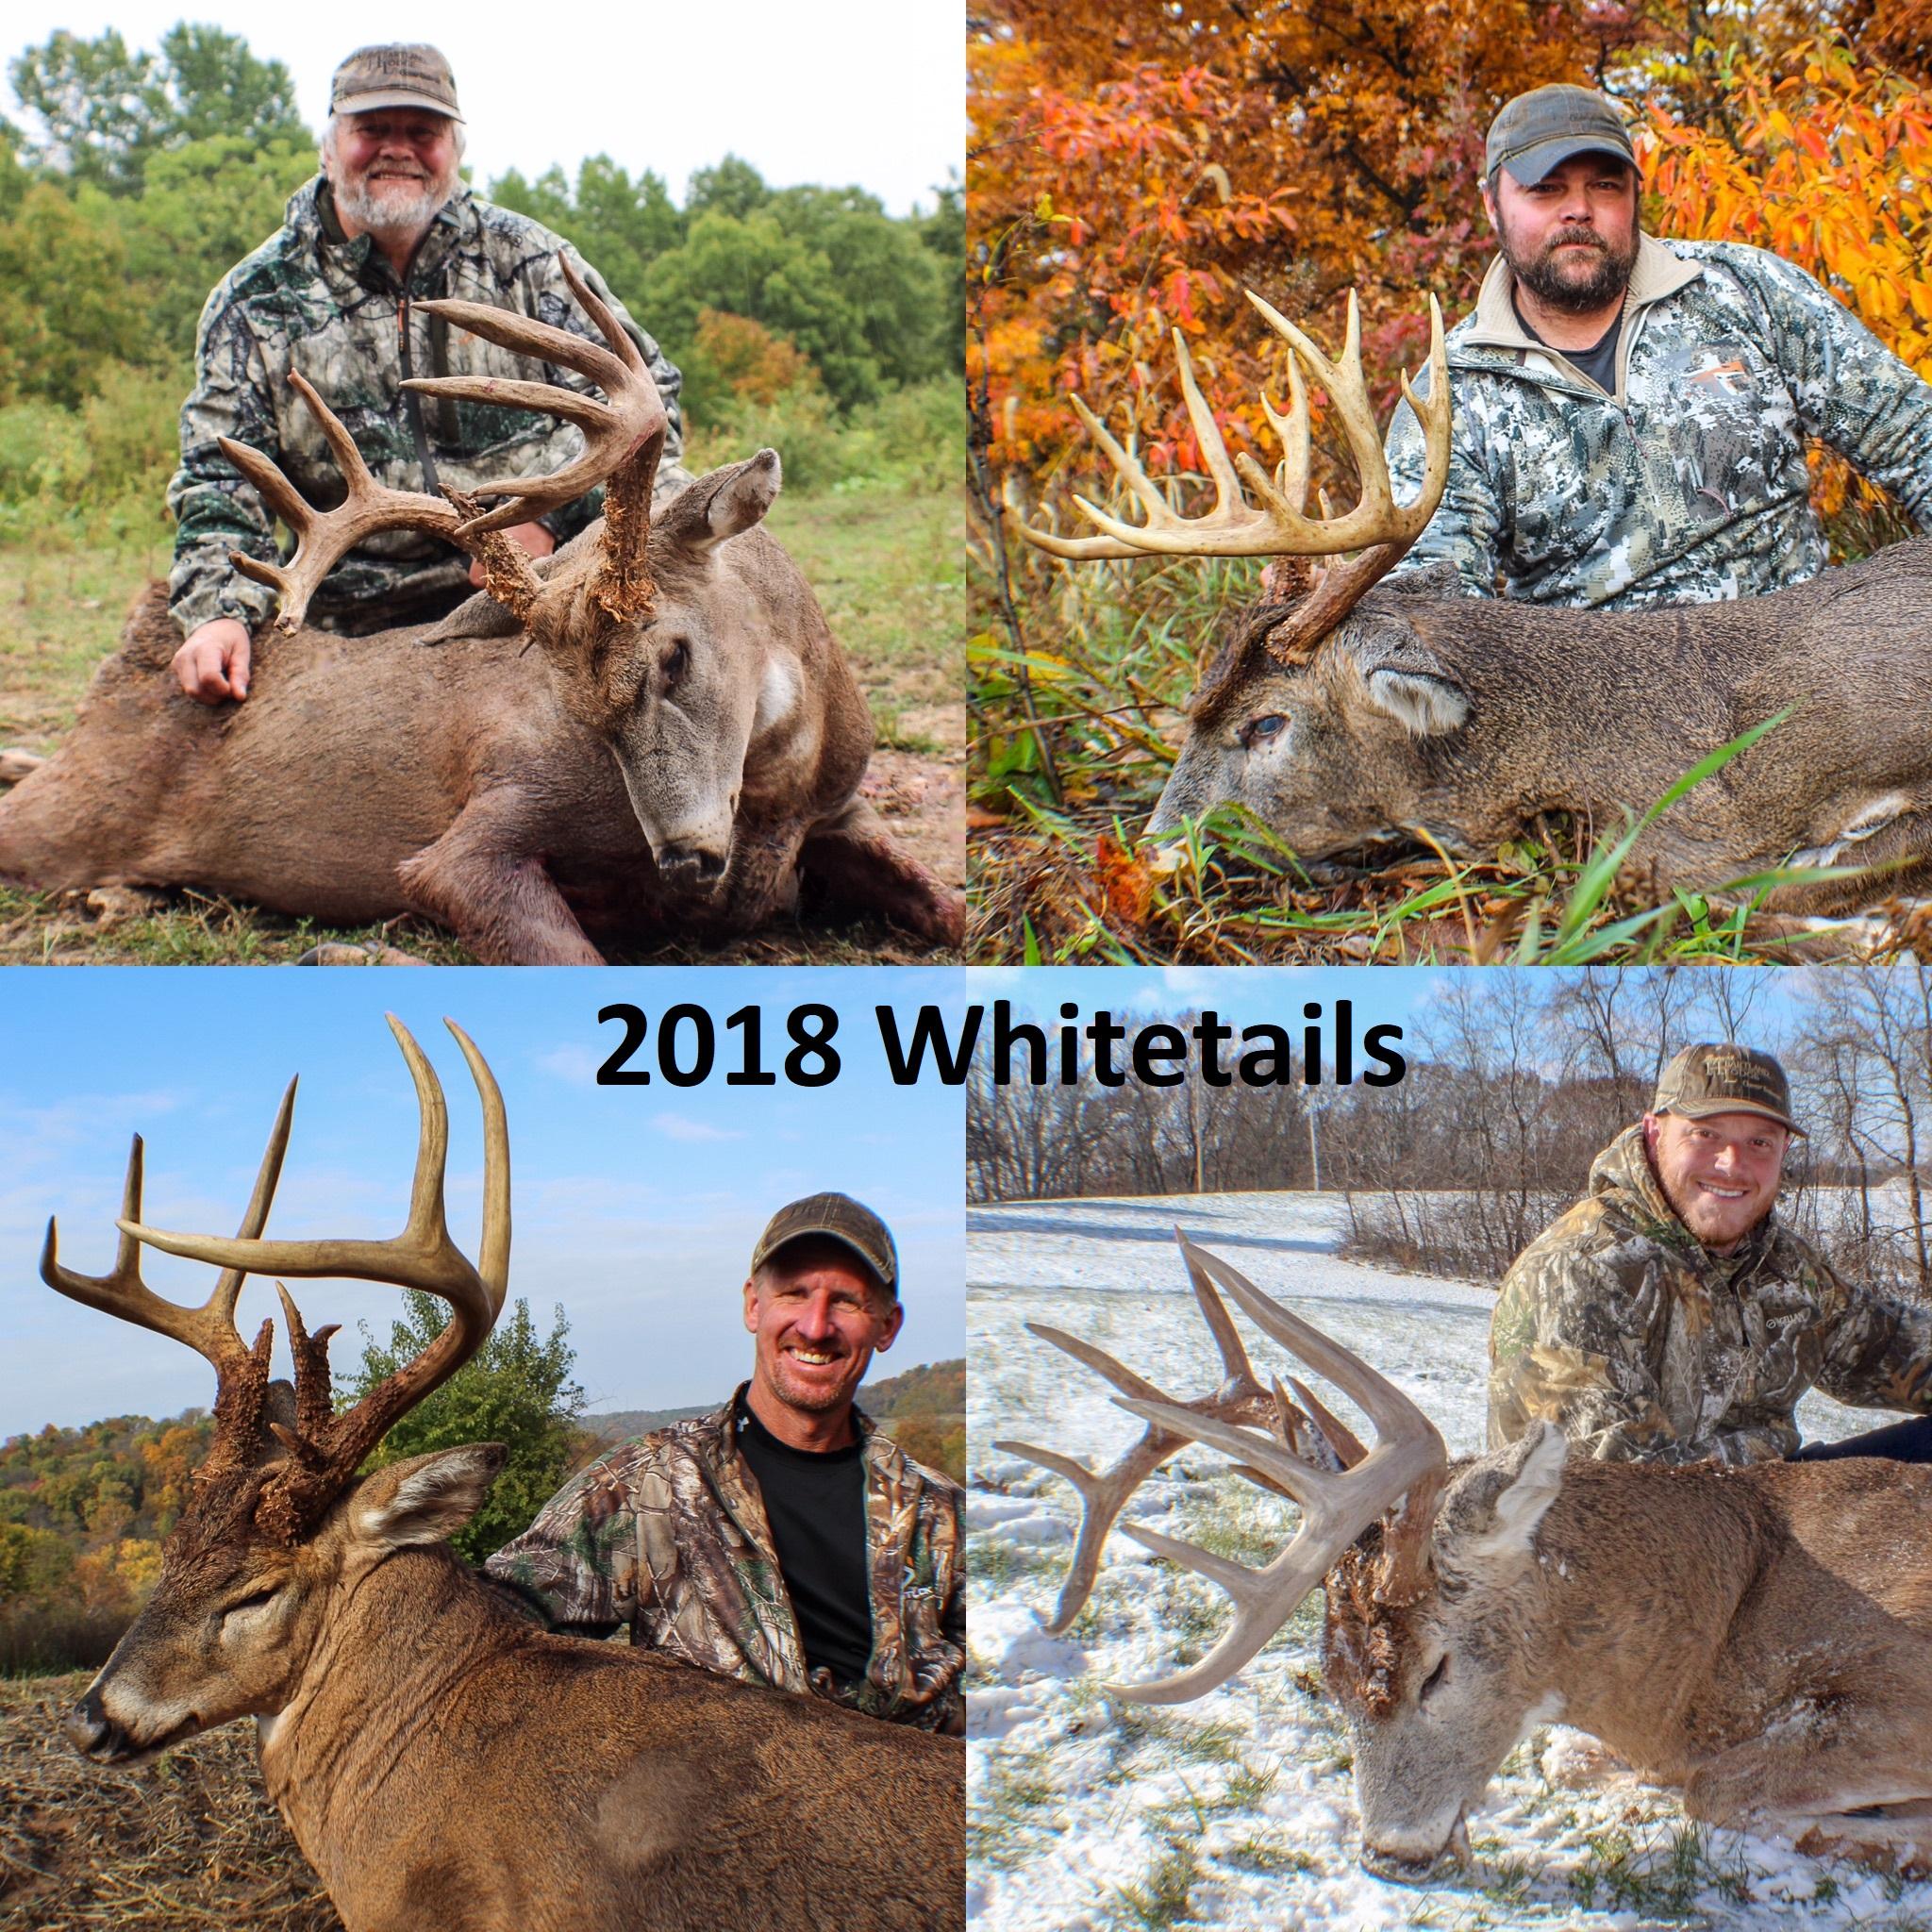 Pike County Illinois Whitetail Hunts 2020 | Heartland Lodge